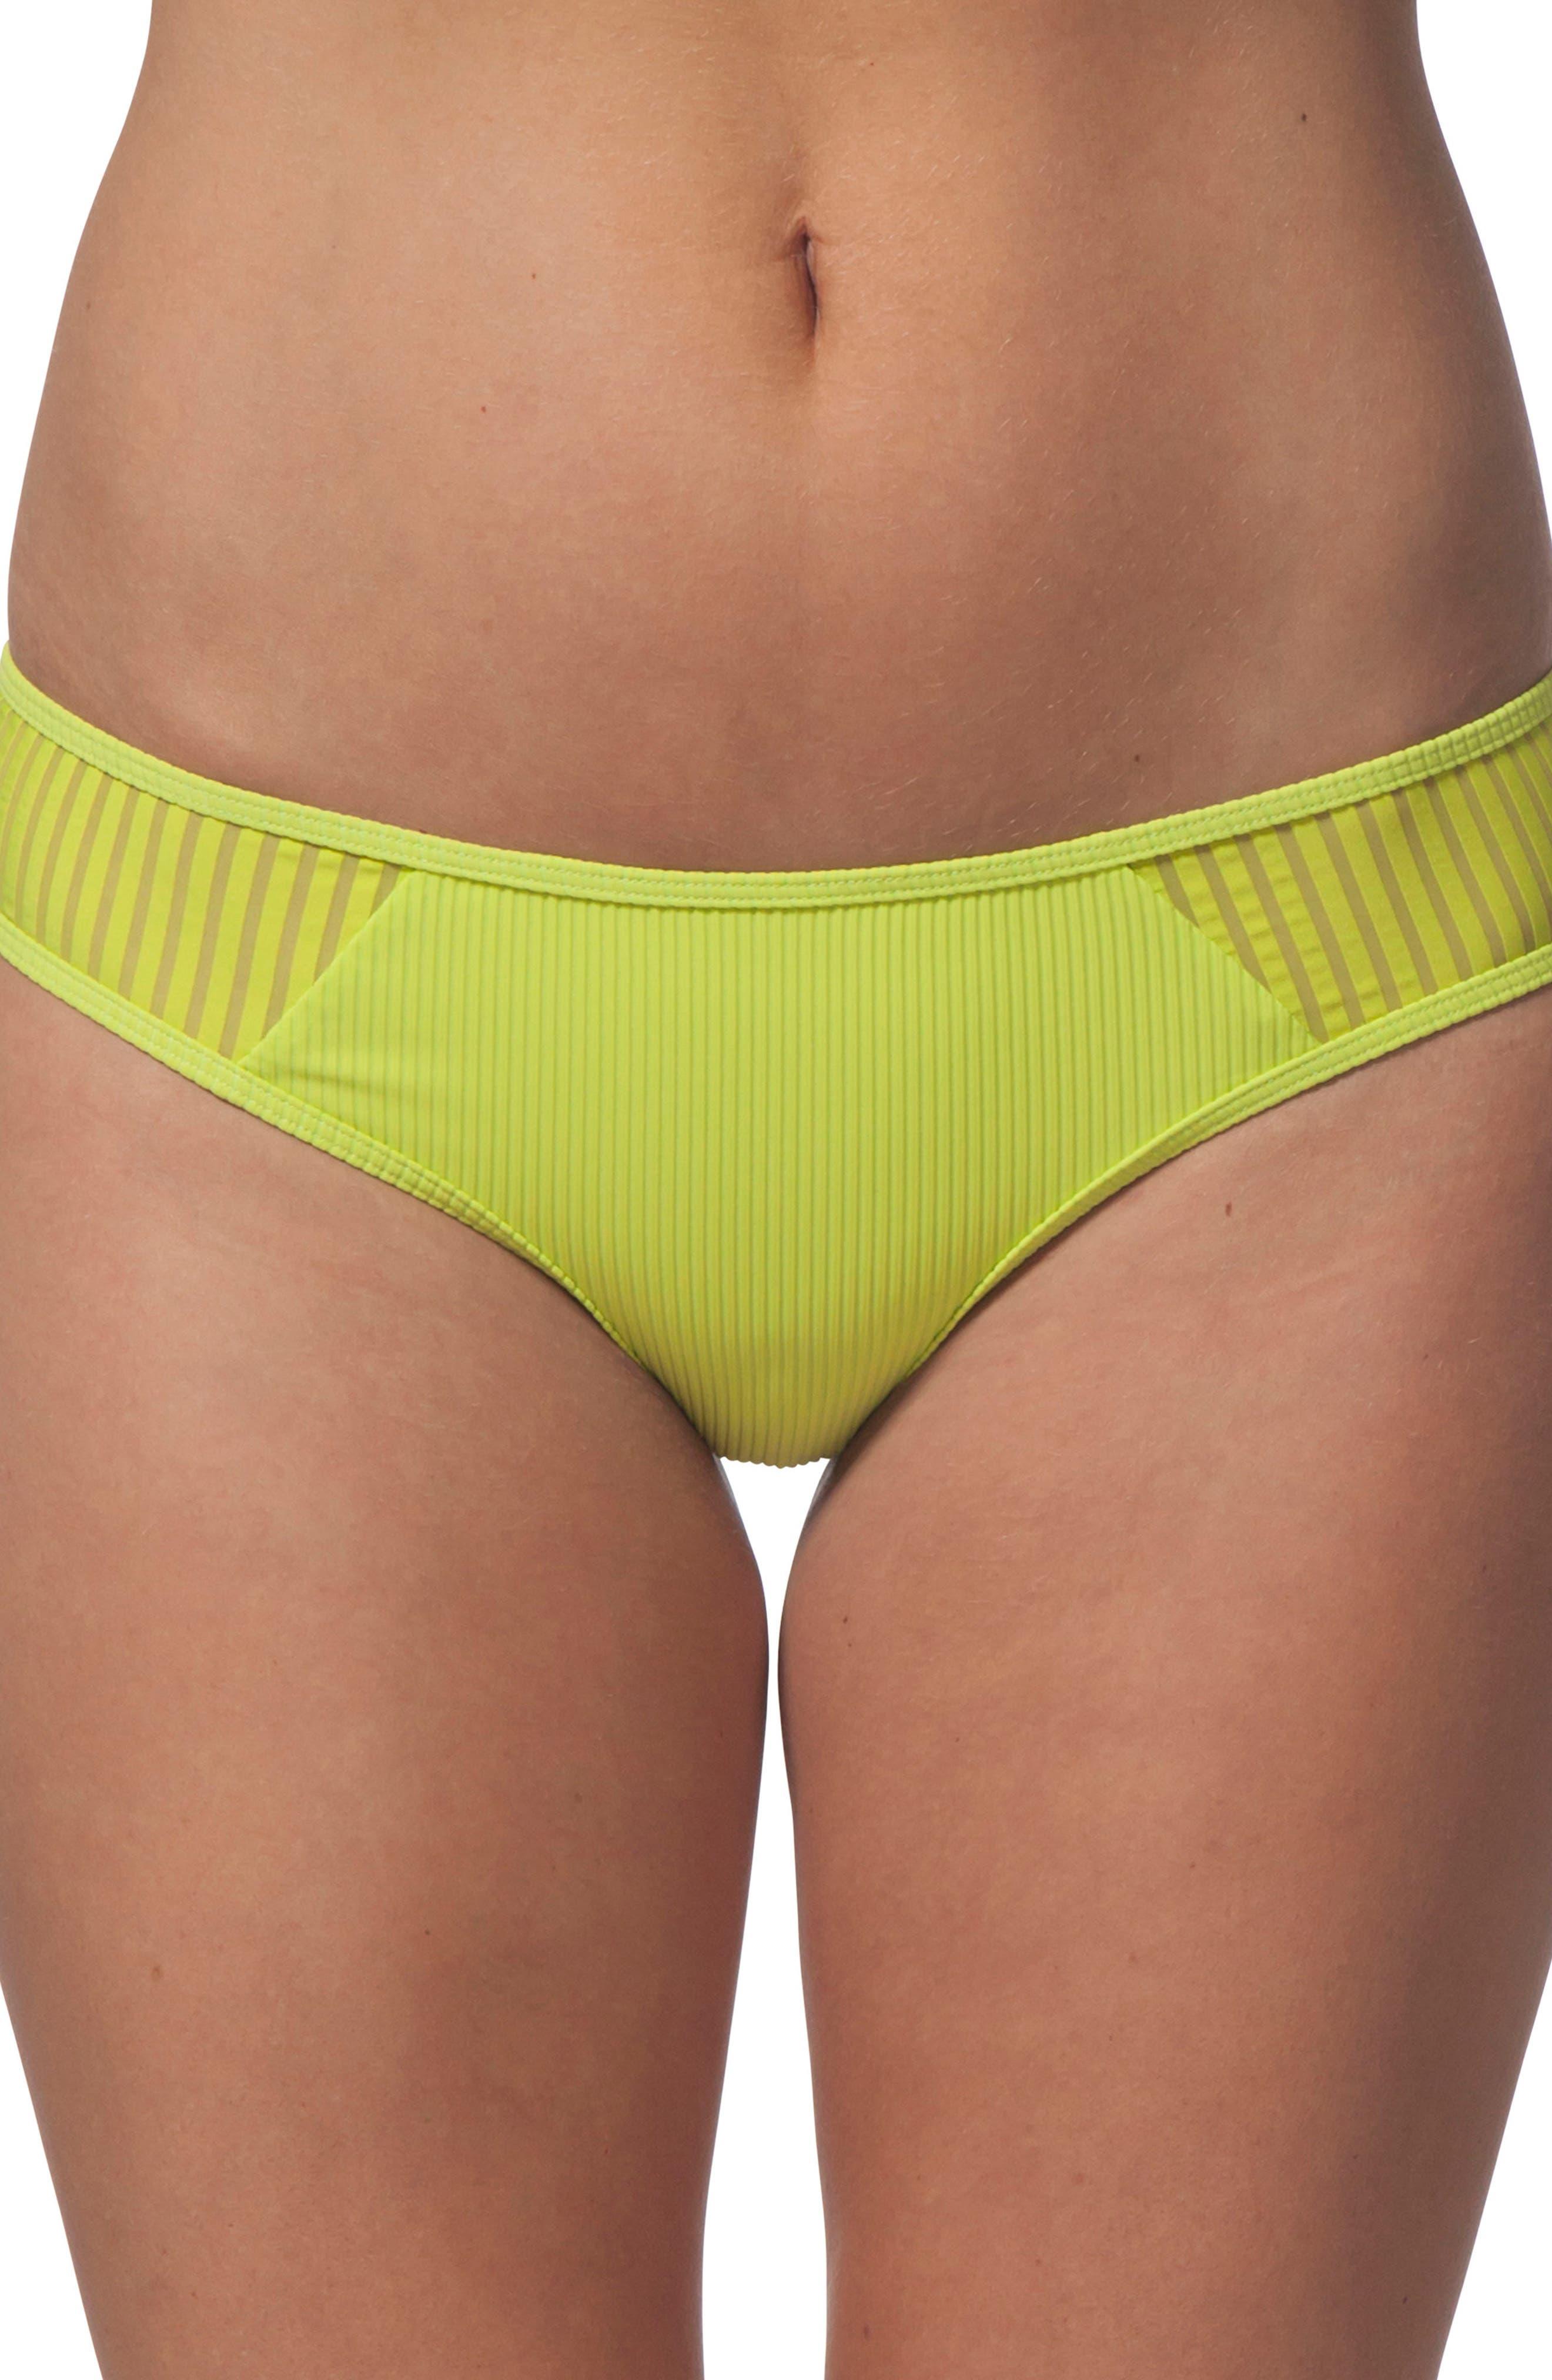 Designer Surf Hipster Bikini Bottoms,                             Main thumbnail 1, color,                             Neon Lime